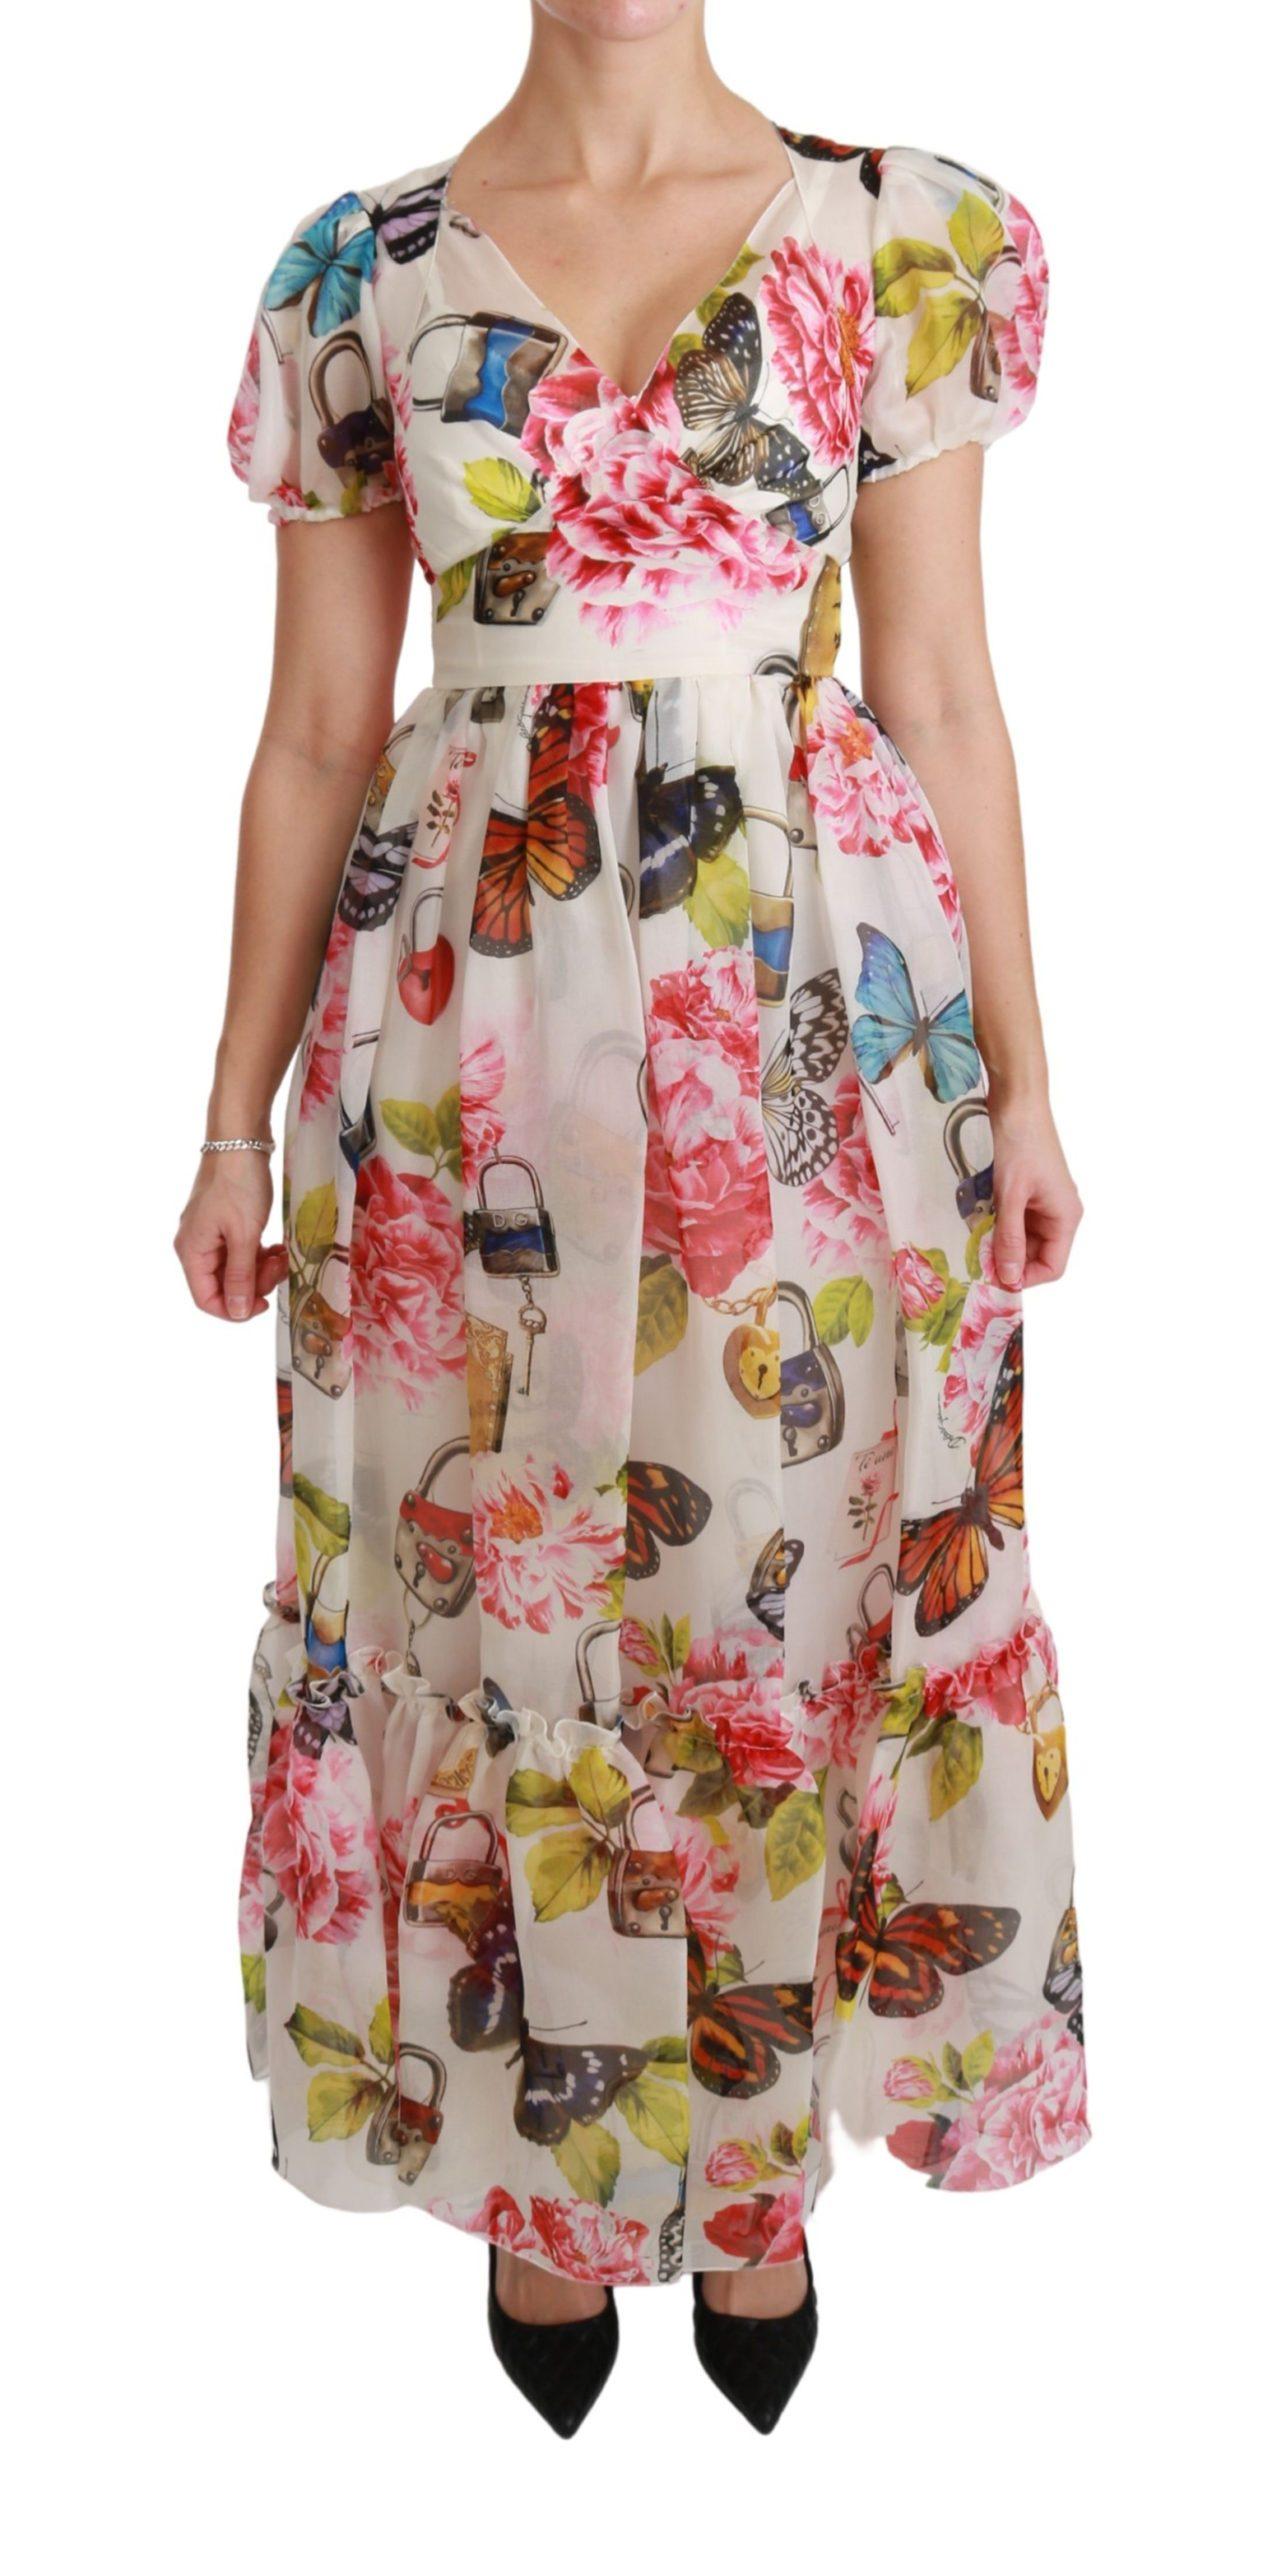 Dolce & Gabbana Women's Silk Butterfly A-Line Shift Gown Dress White DR2451 - IT36 | XS